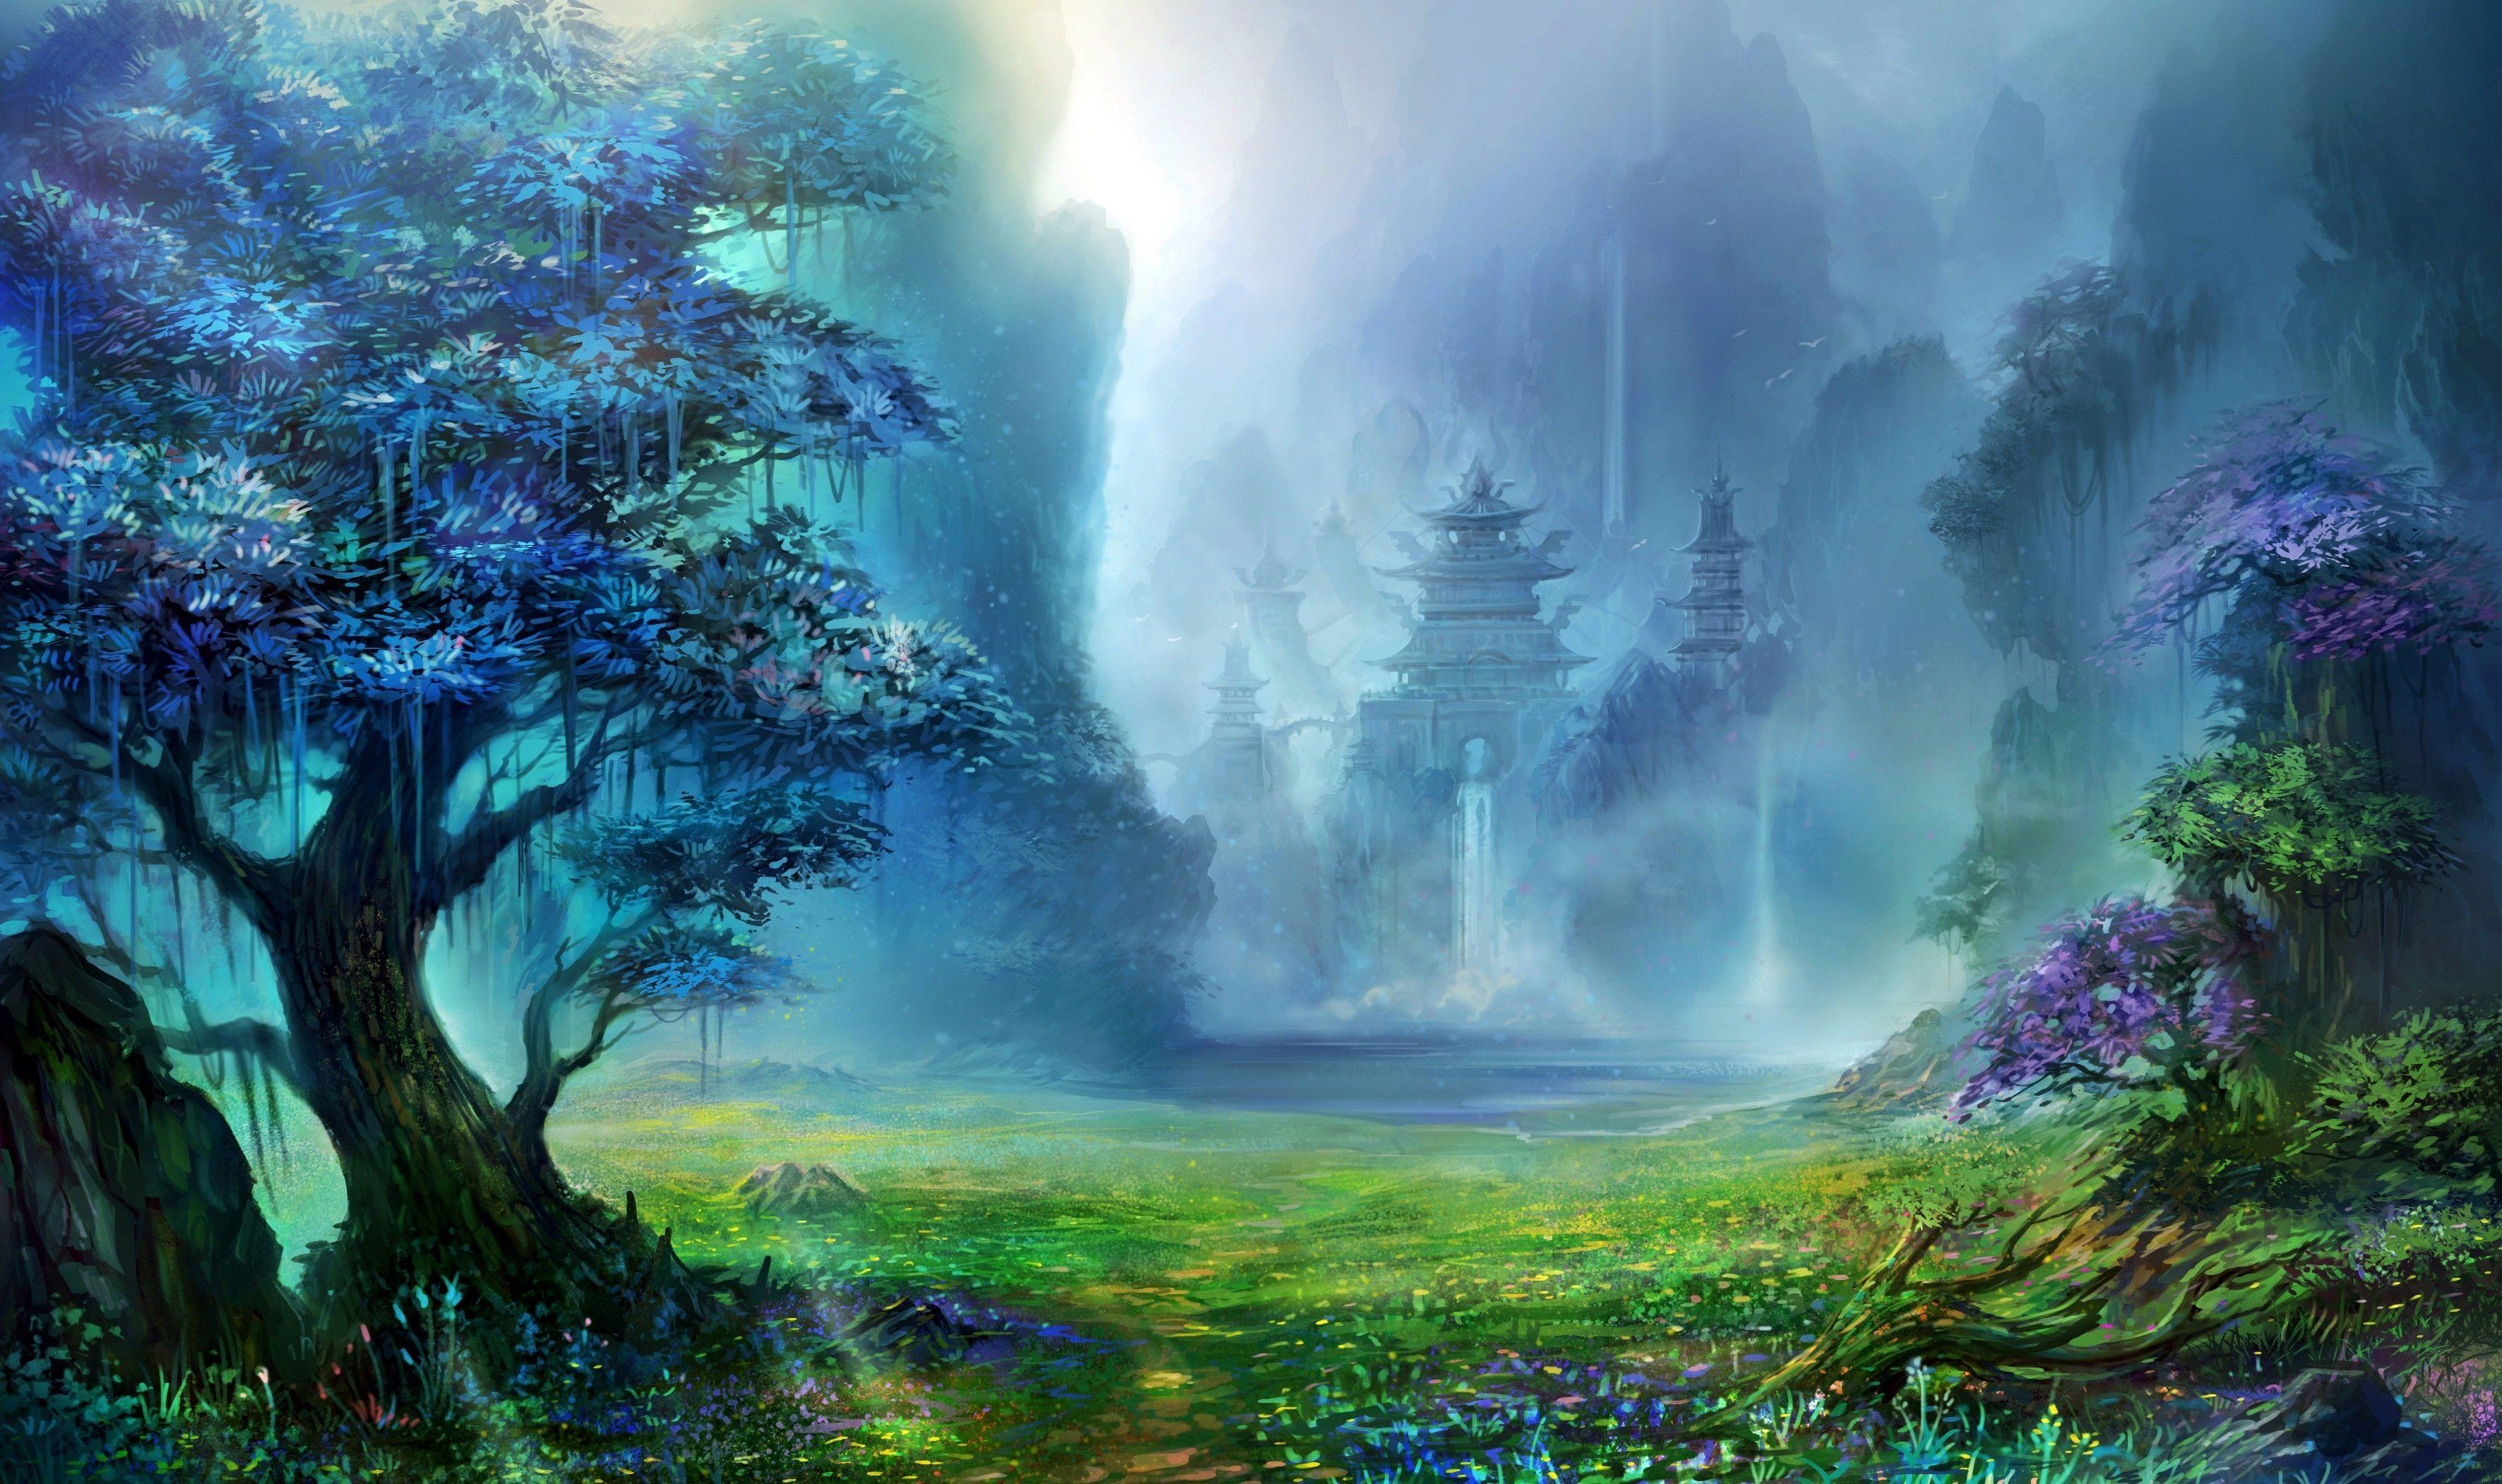 Pin By Rezo Chkhikvadze On Art Creative Design Fantasy Landscape Waterfall Artwork Castle Painting